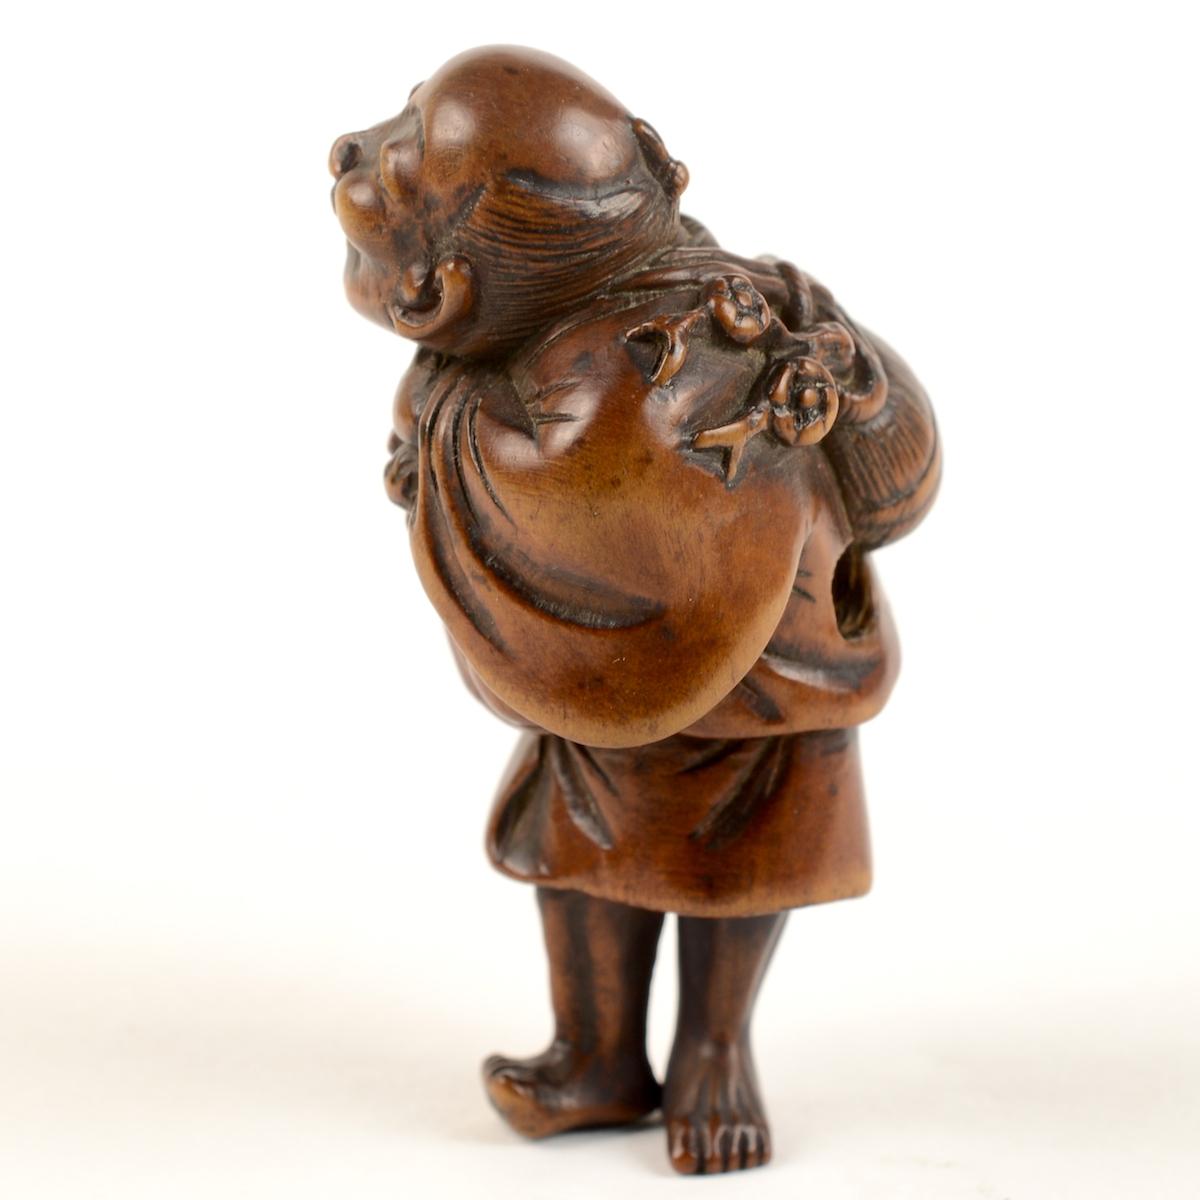 Wood hoshigaki seller netsuke left profile